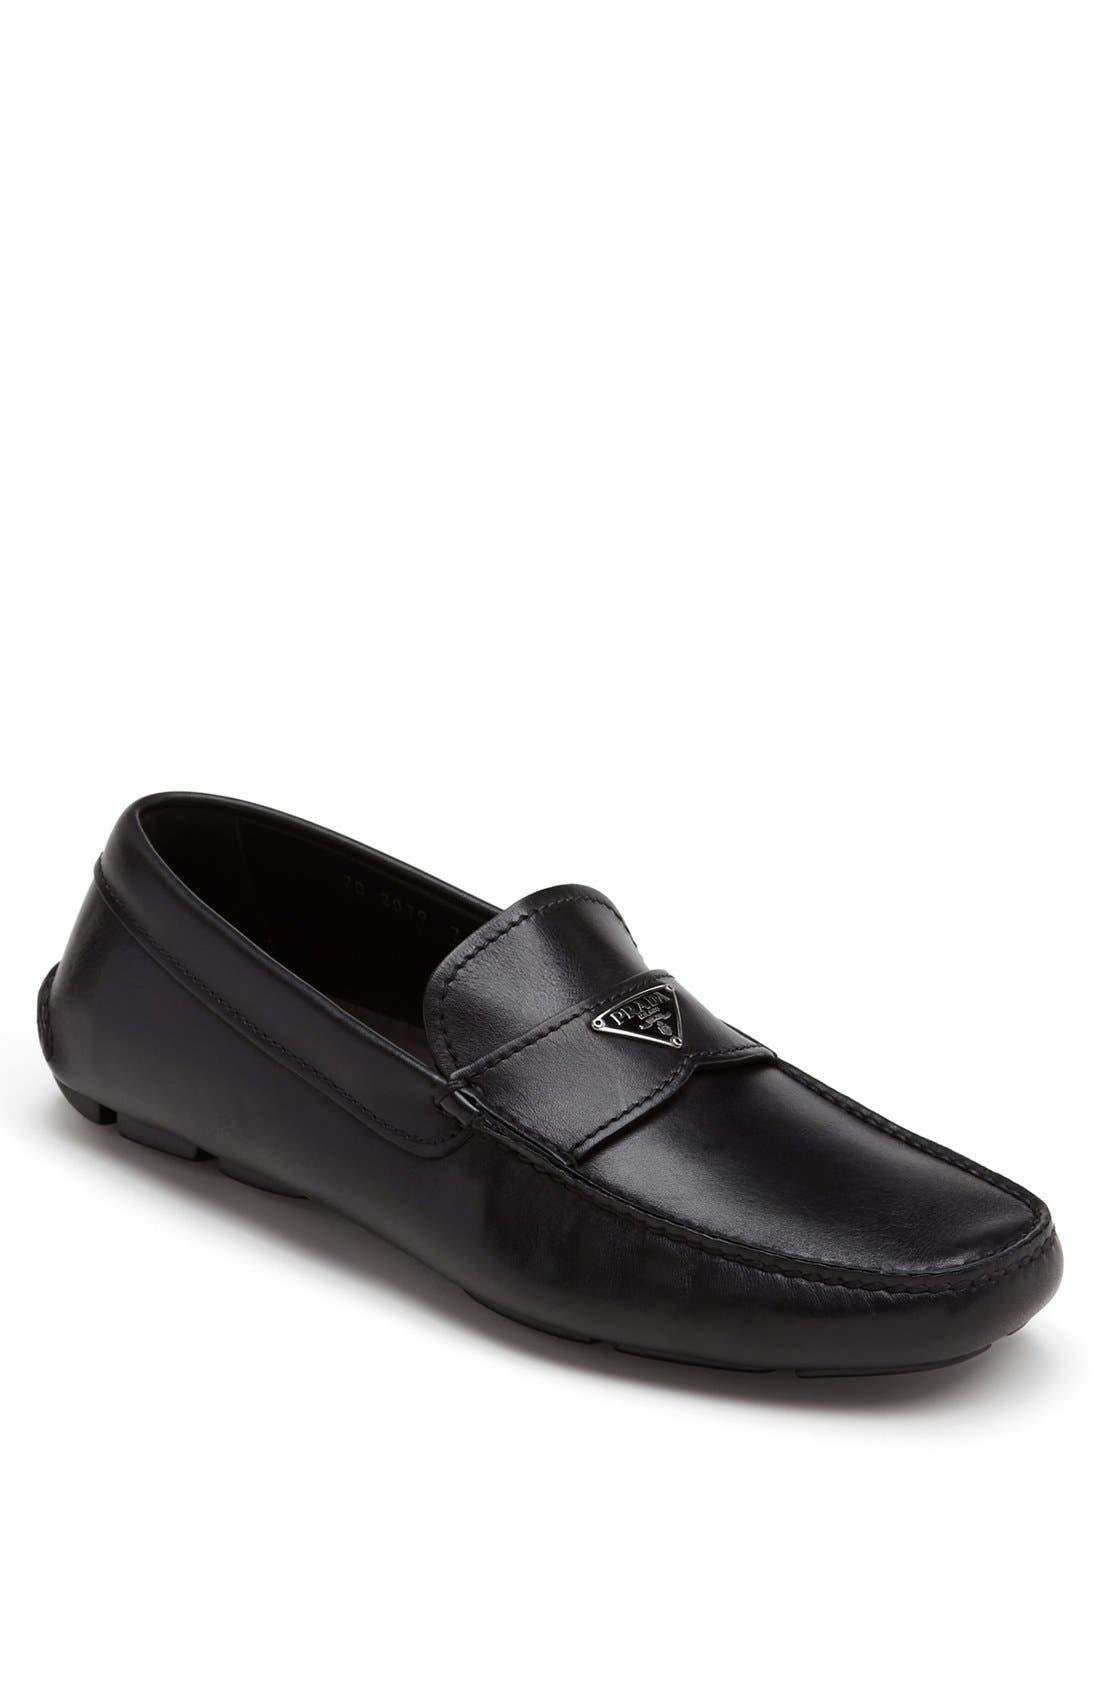 Main Image - Prada Logo Bit Driving Shoe (Men)